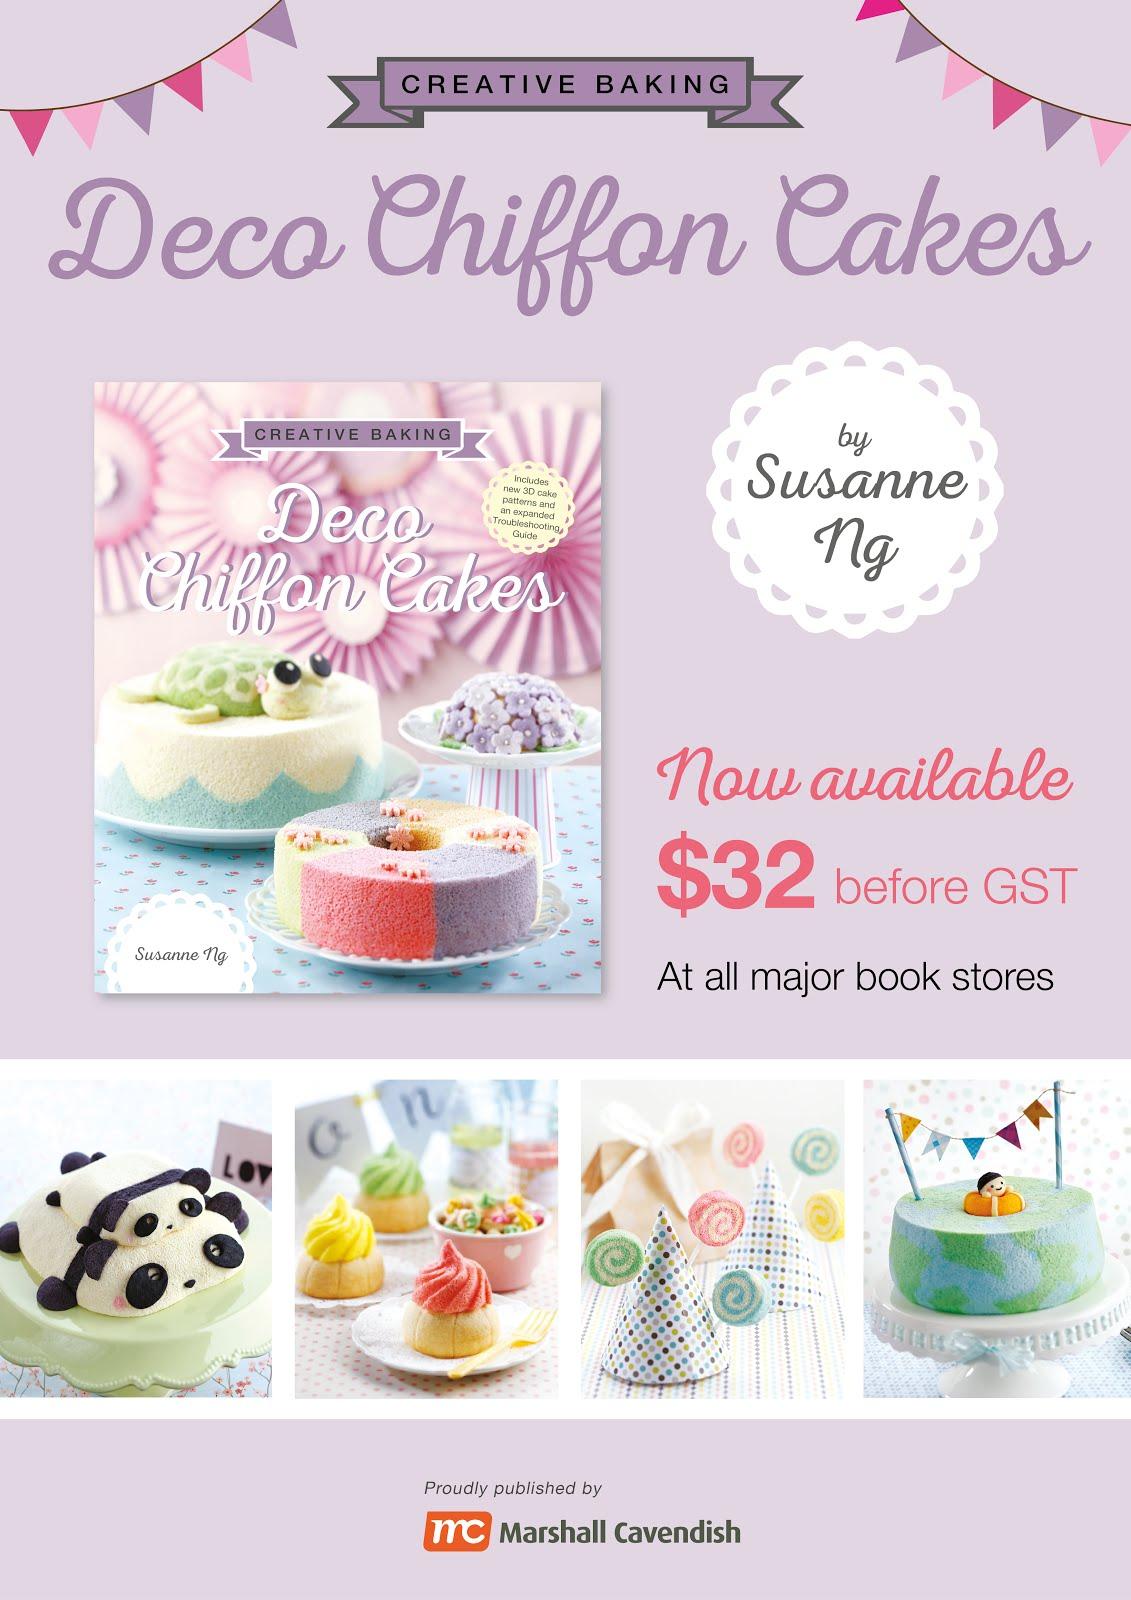 Deco Chiffon Cakes Book (a bestseller in Kinokuniya)